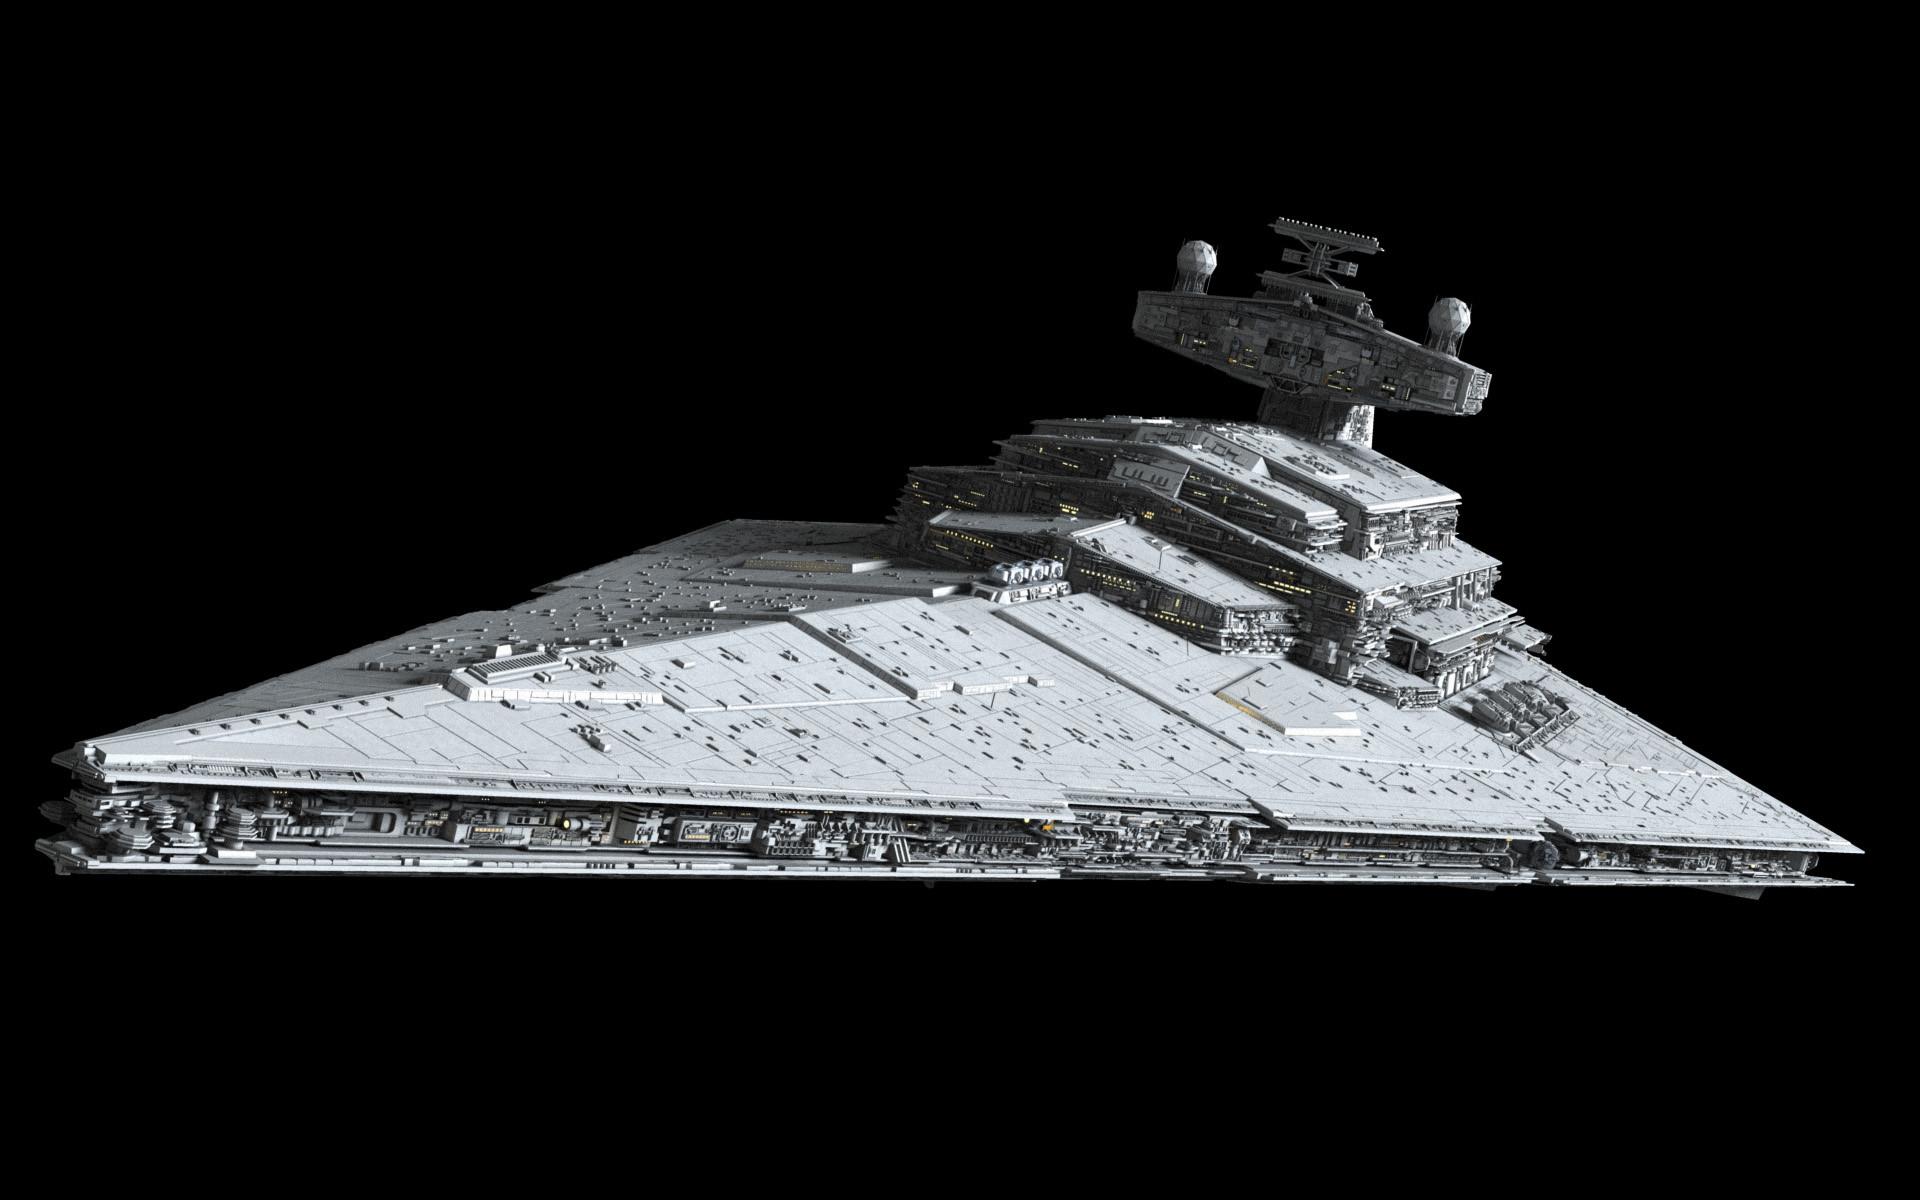 Altor-class Fleet Replenishment Ship: 1, Uxor